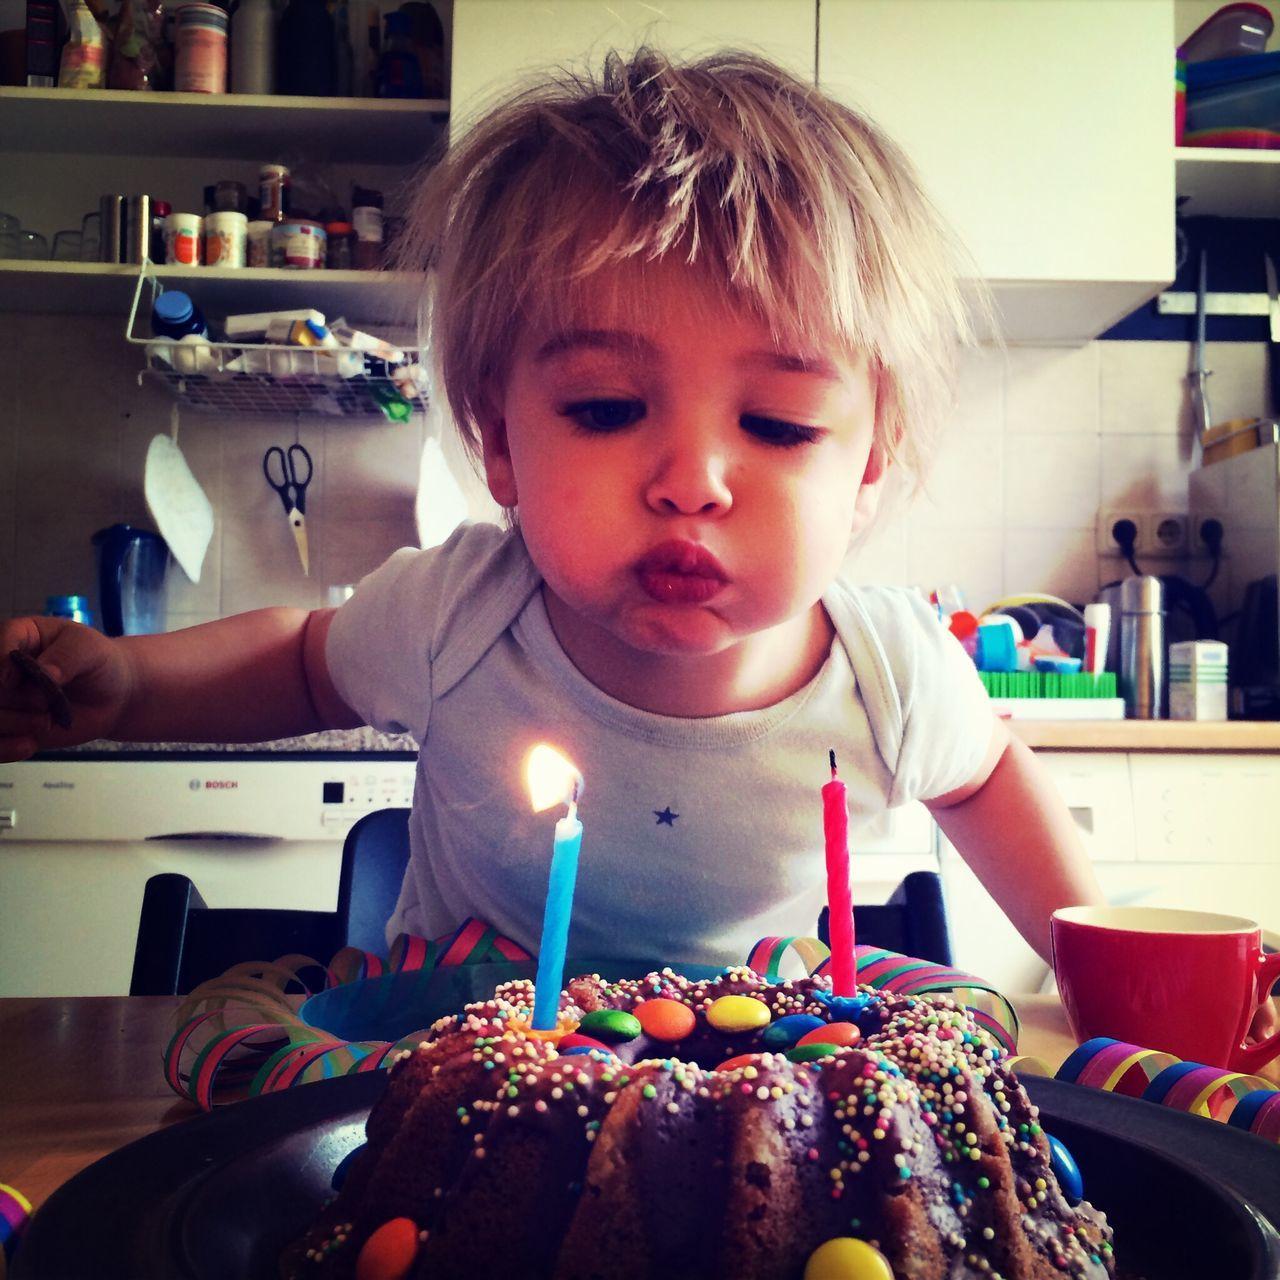 Birthday Birthday Cake Boy Second Birthday By Candlelight The Portraitist - 2015 EyeEm Awards The Moment - 2015 EyeEm Awards